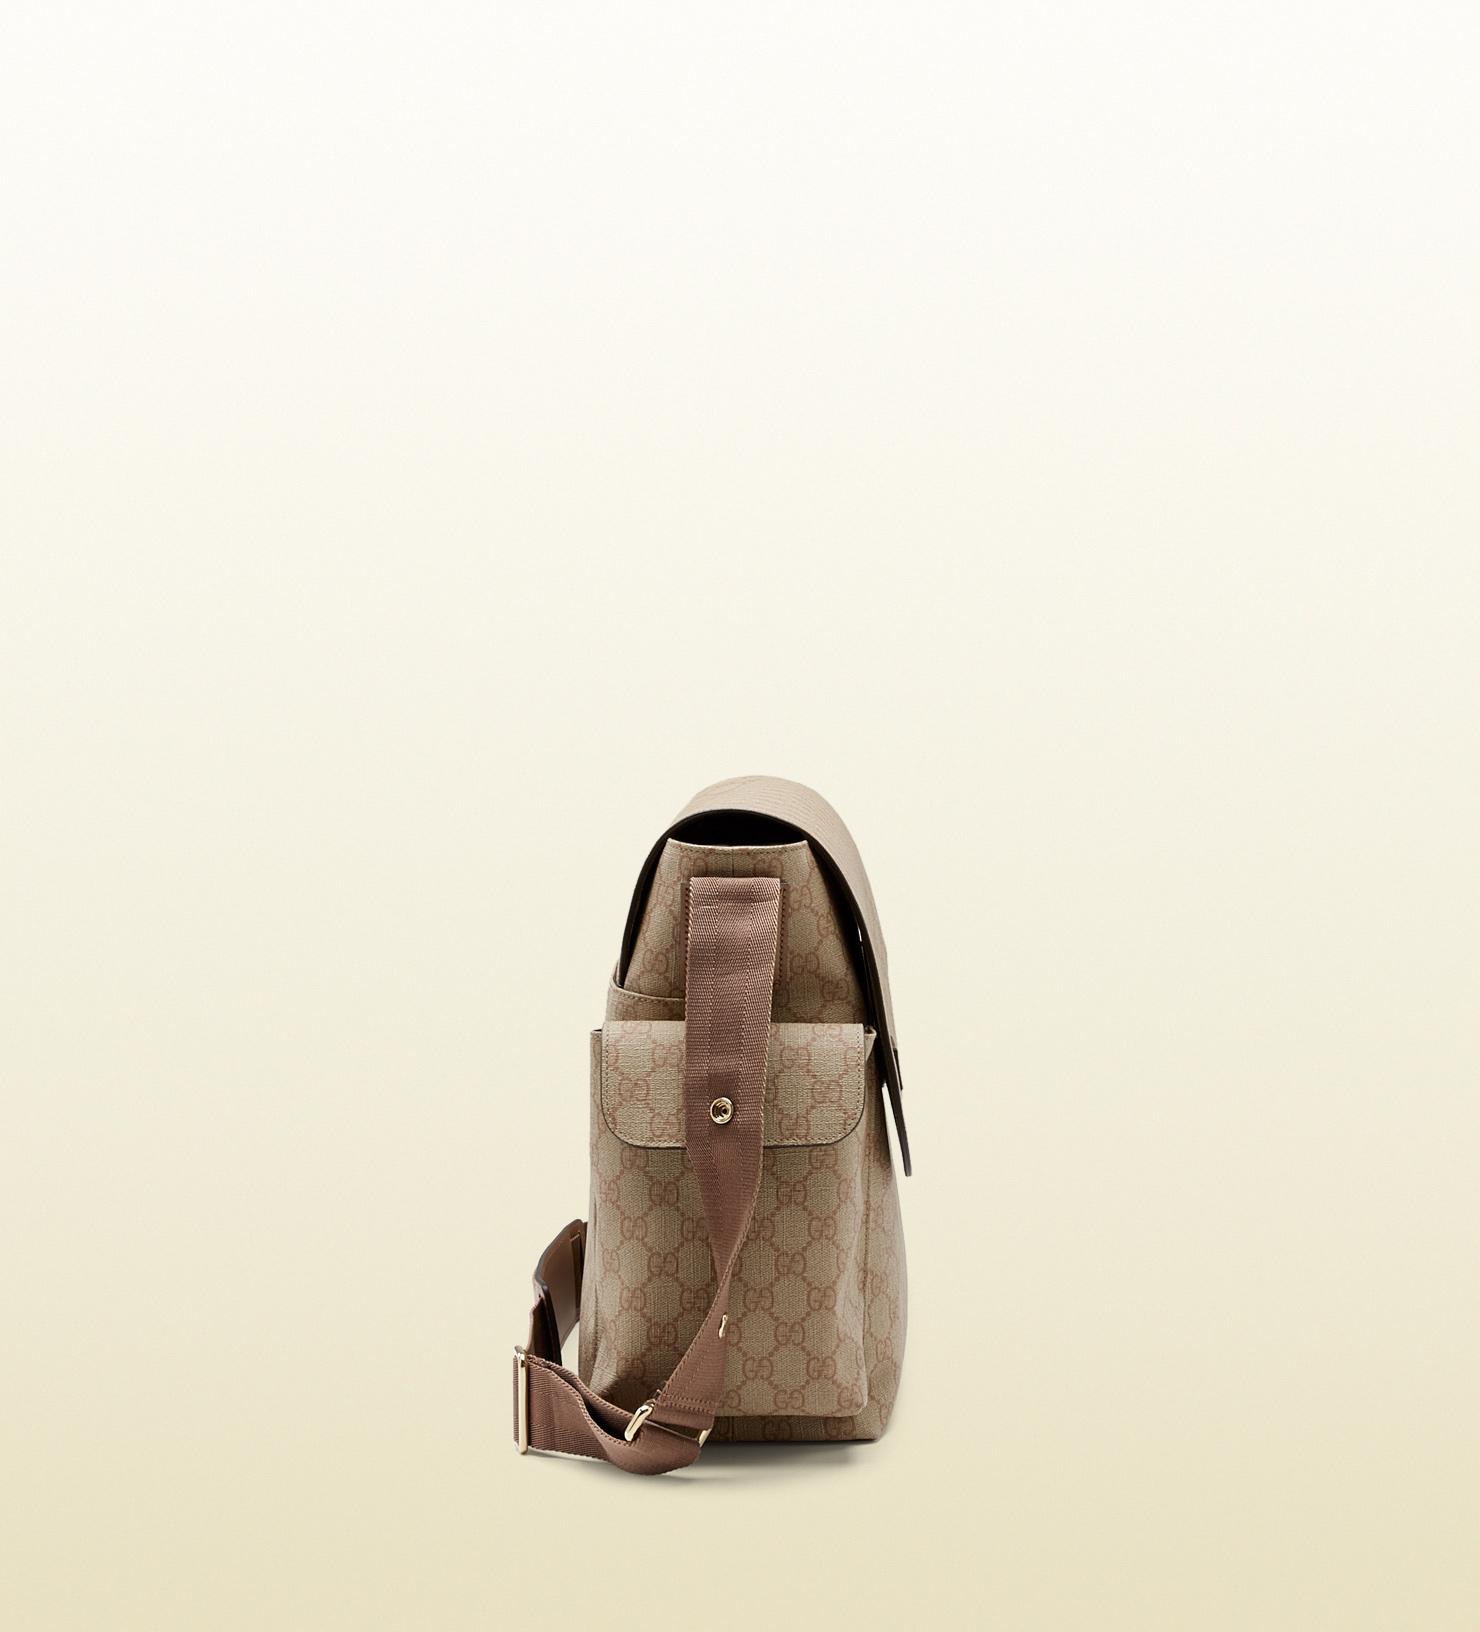 d2876a8b6513 Gucci Gg Supreme Canvas Messenger Diaper Bag in Natural for Men - Lyst